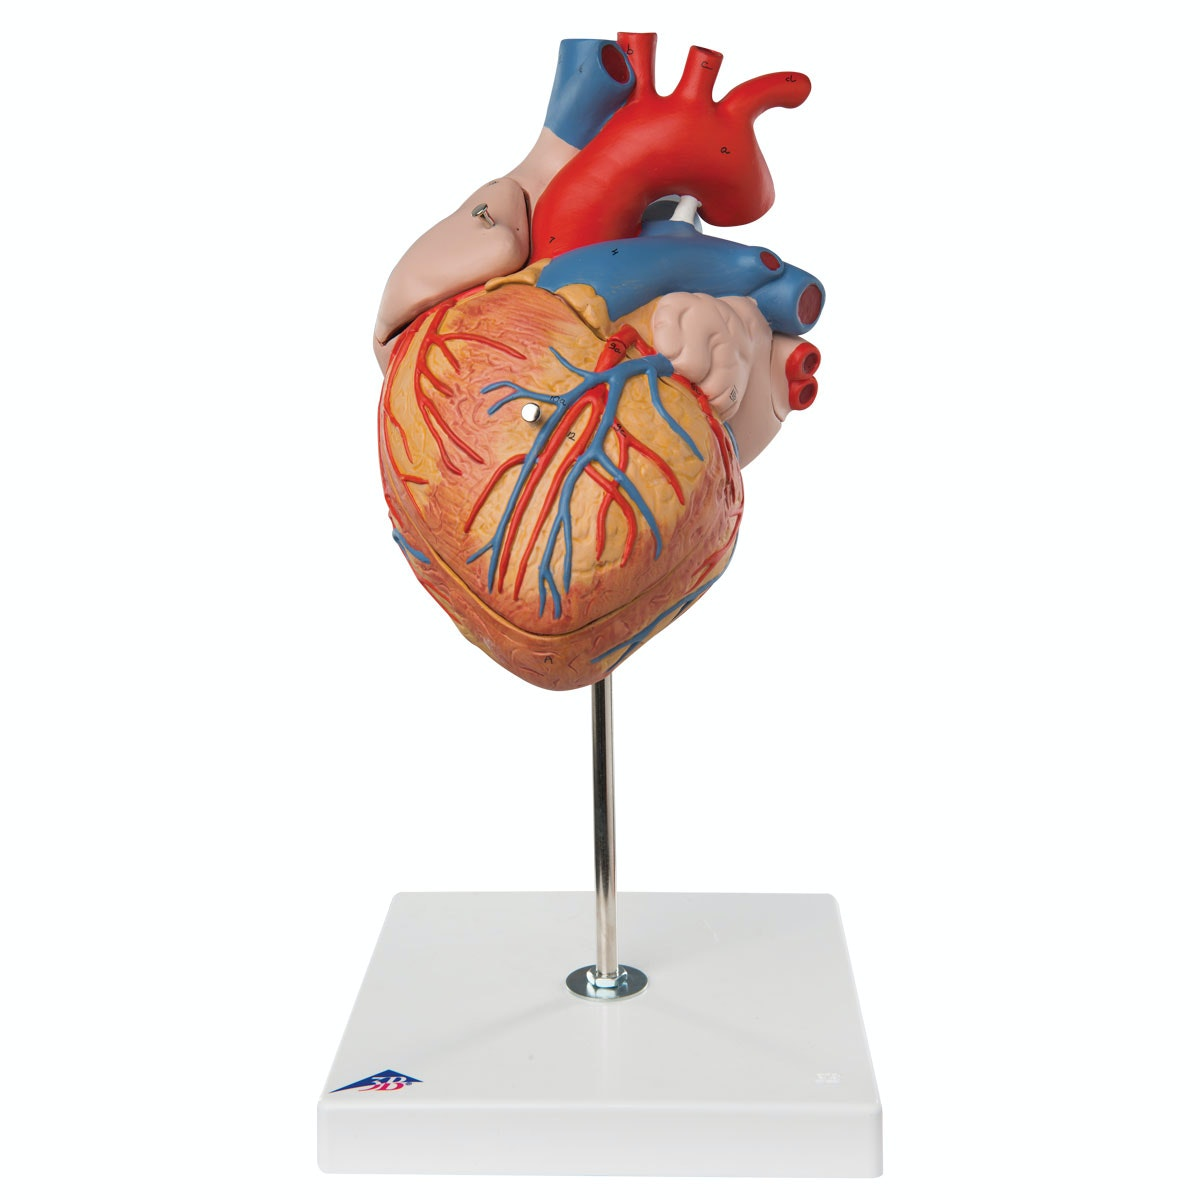 Hjerte 2 x normalstørrelse i 4 dele